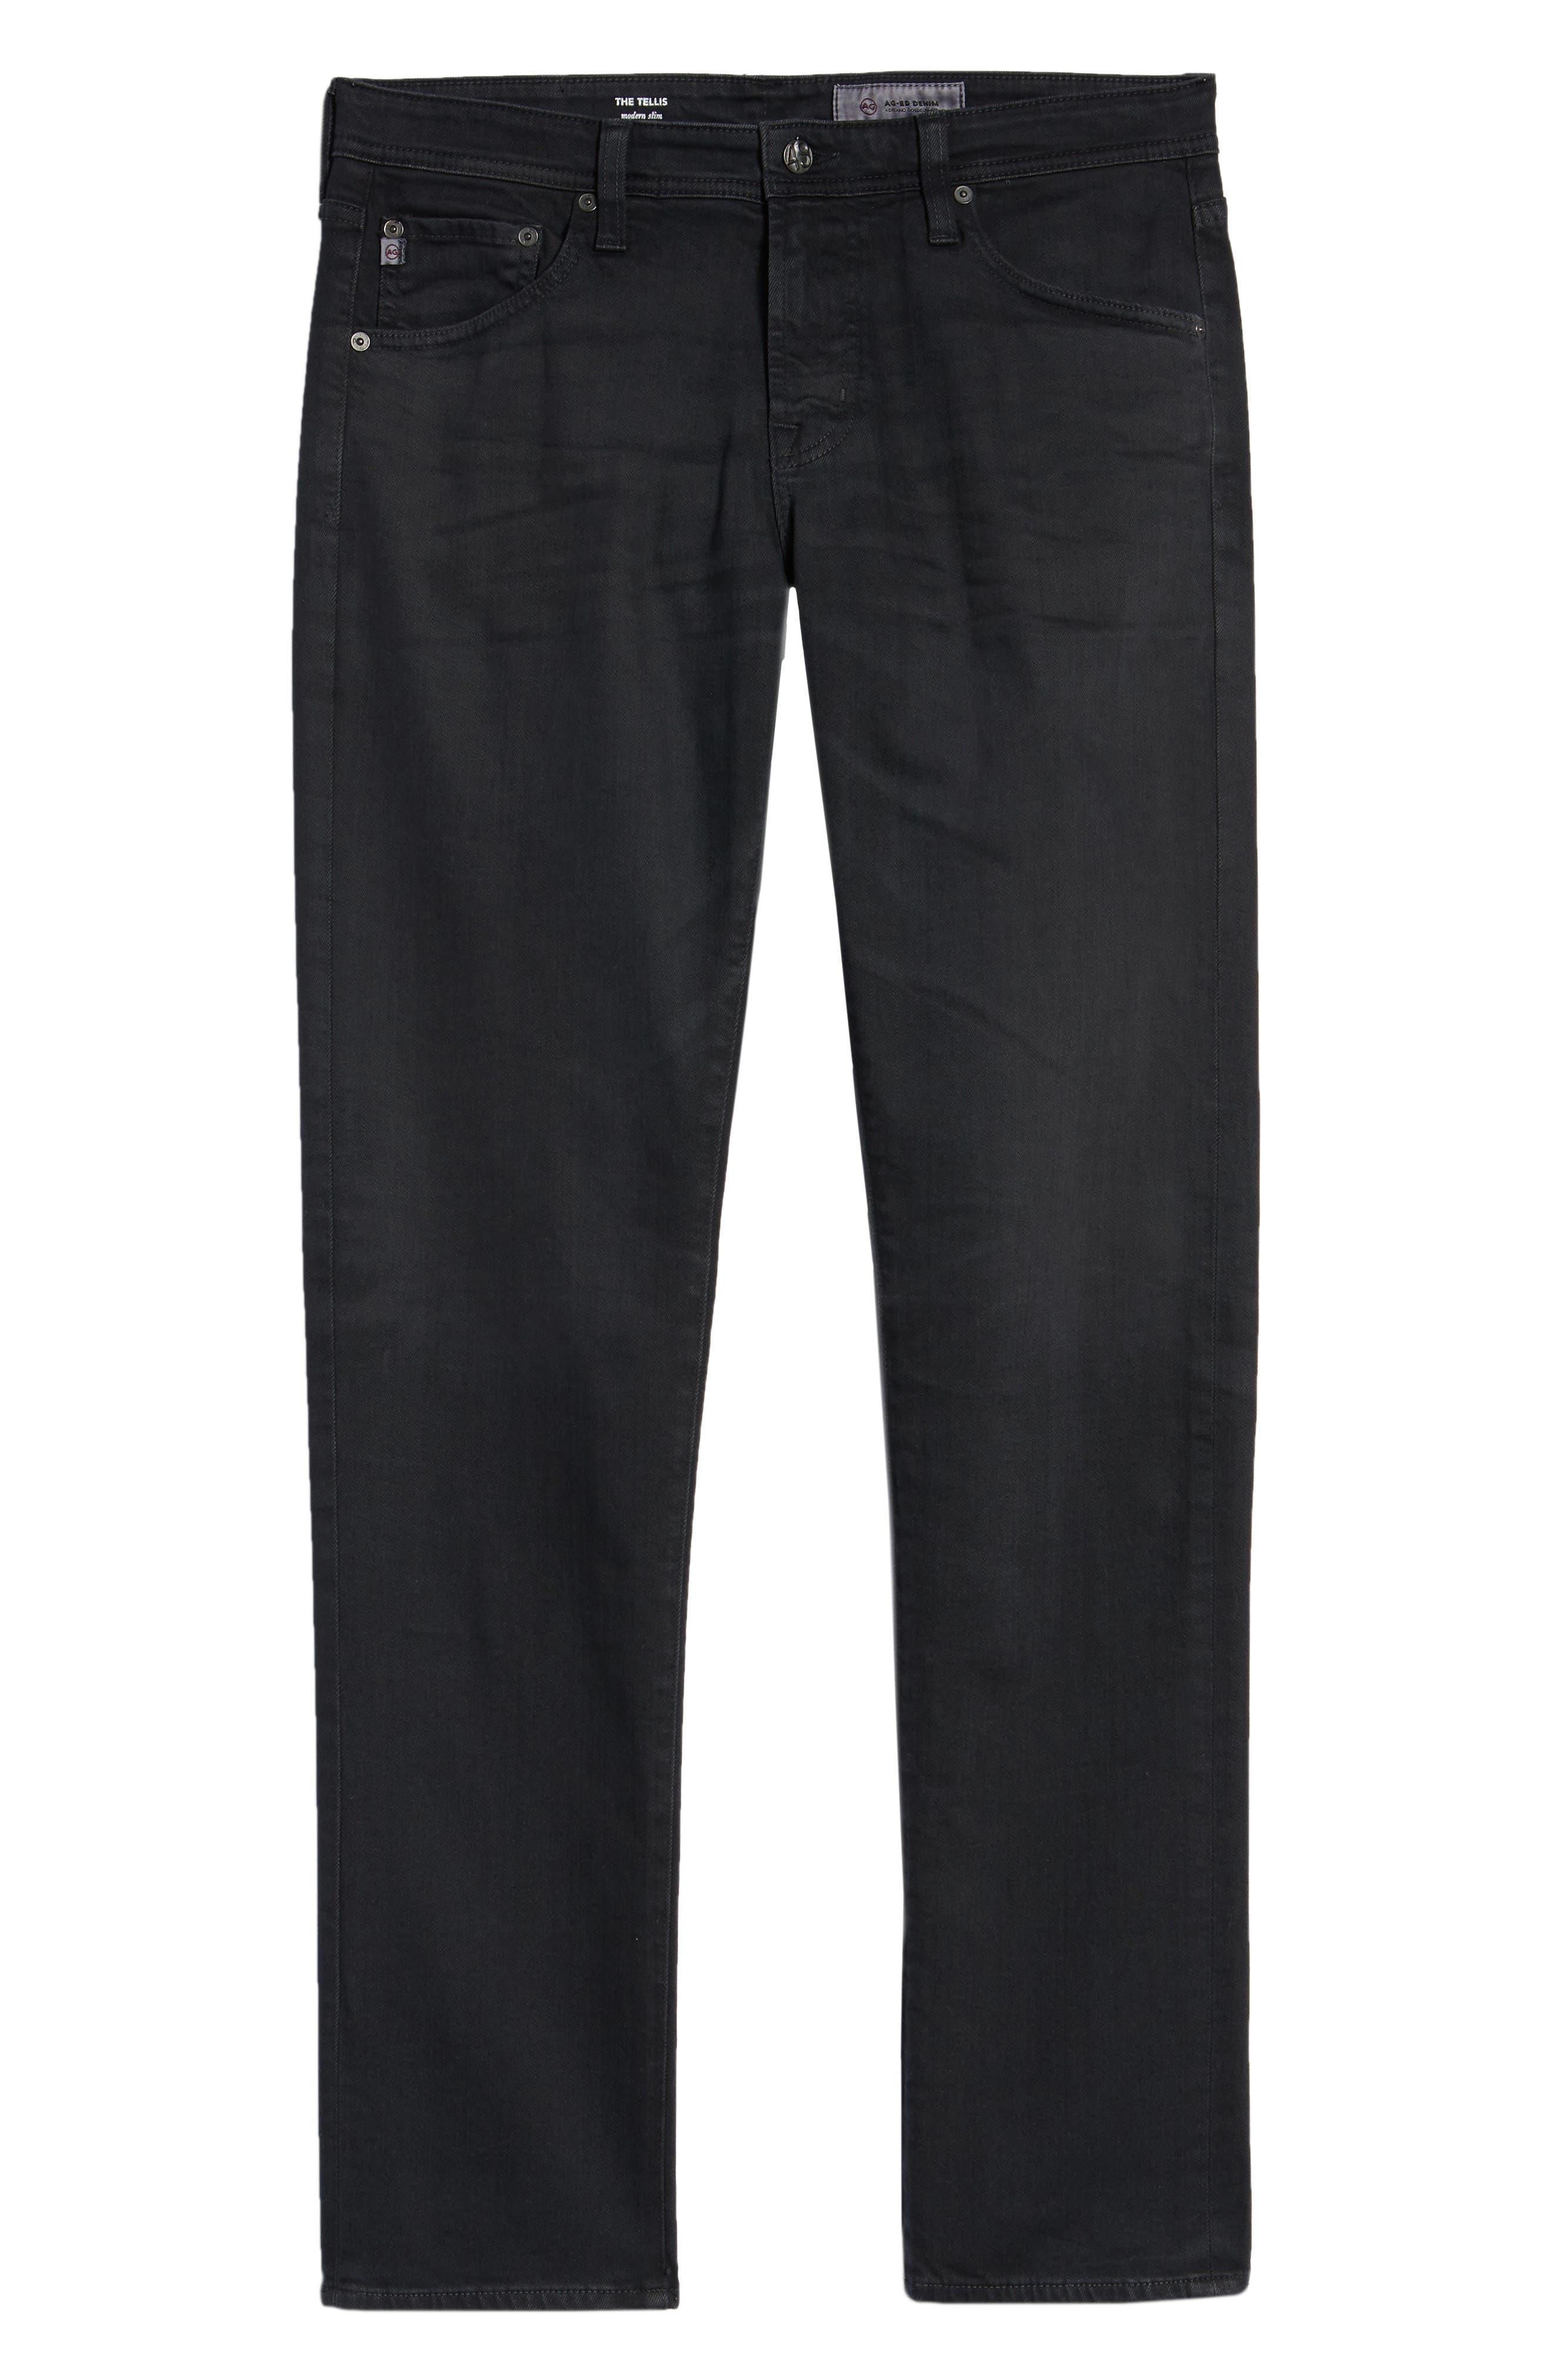 Tellis Slim Fit Jeans,                             Alternate thumbnail 6, color,                             7 YEARS GREY STONE